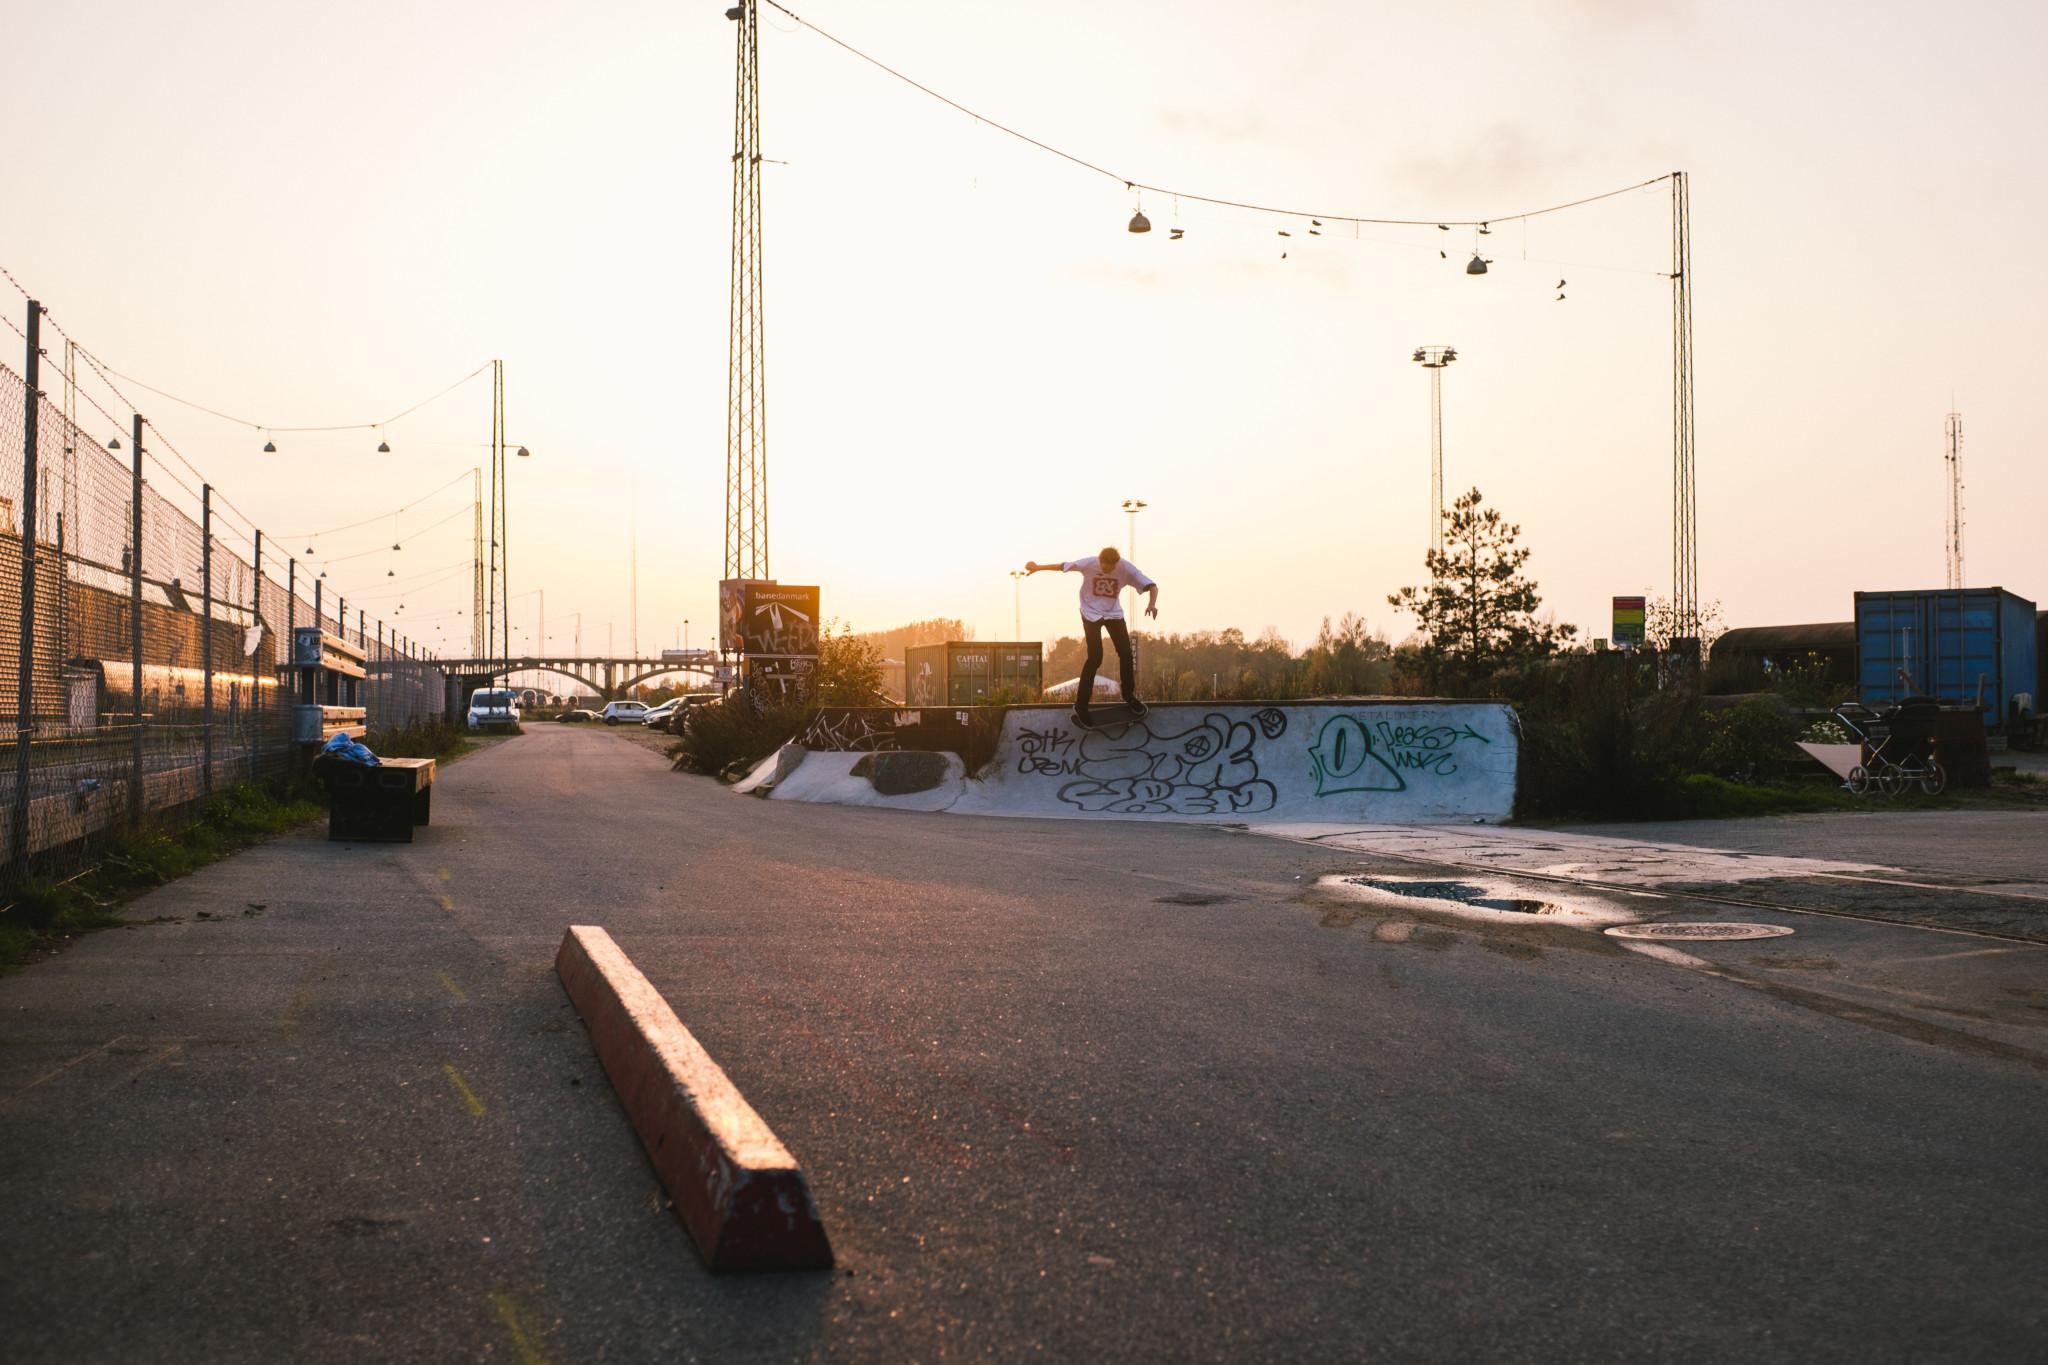 downloads, institut for x skate, skateboard